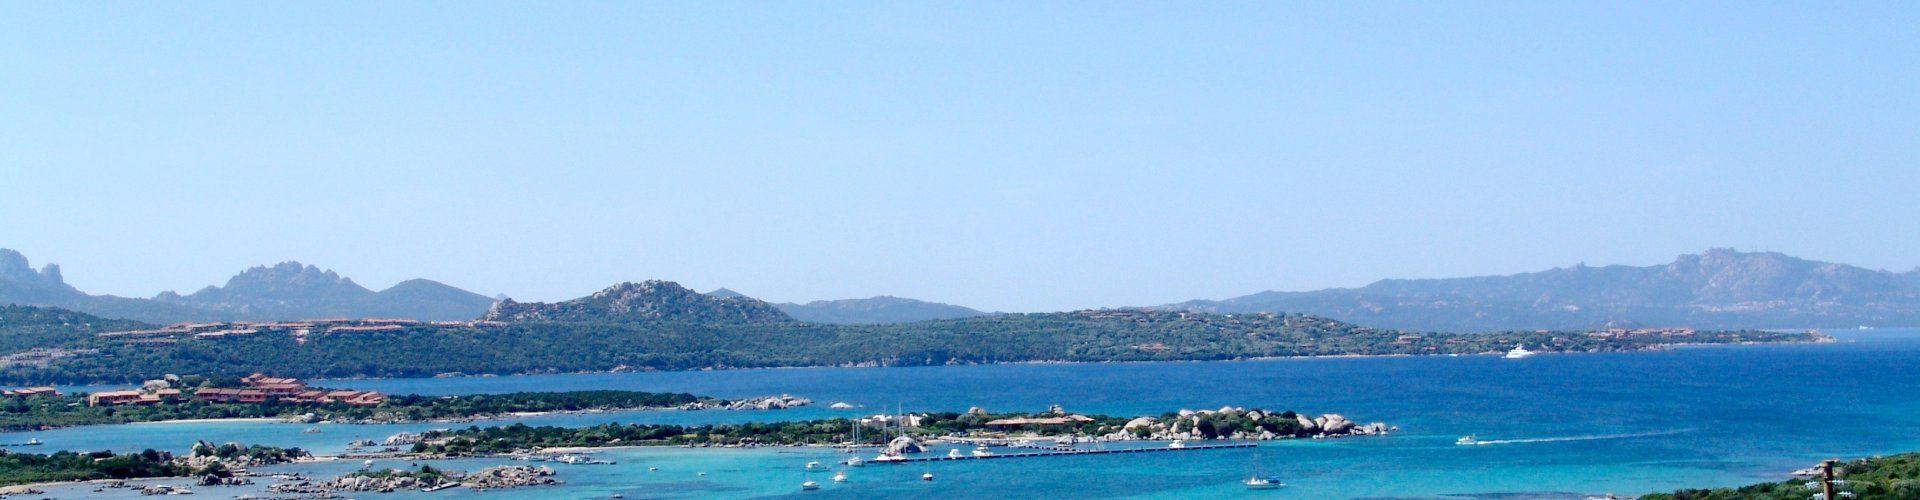 Küstenlandschaft Porto Rotondo